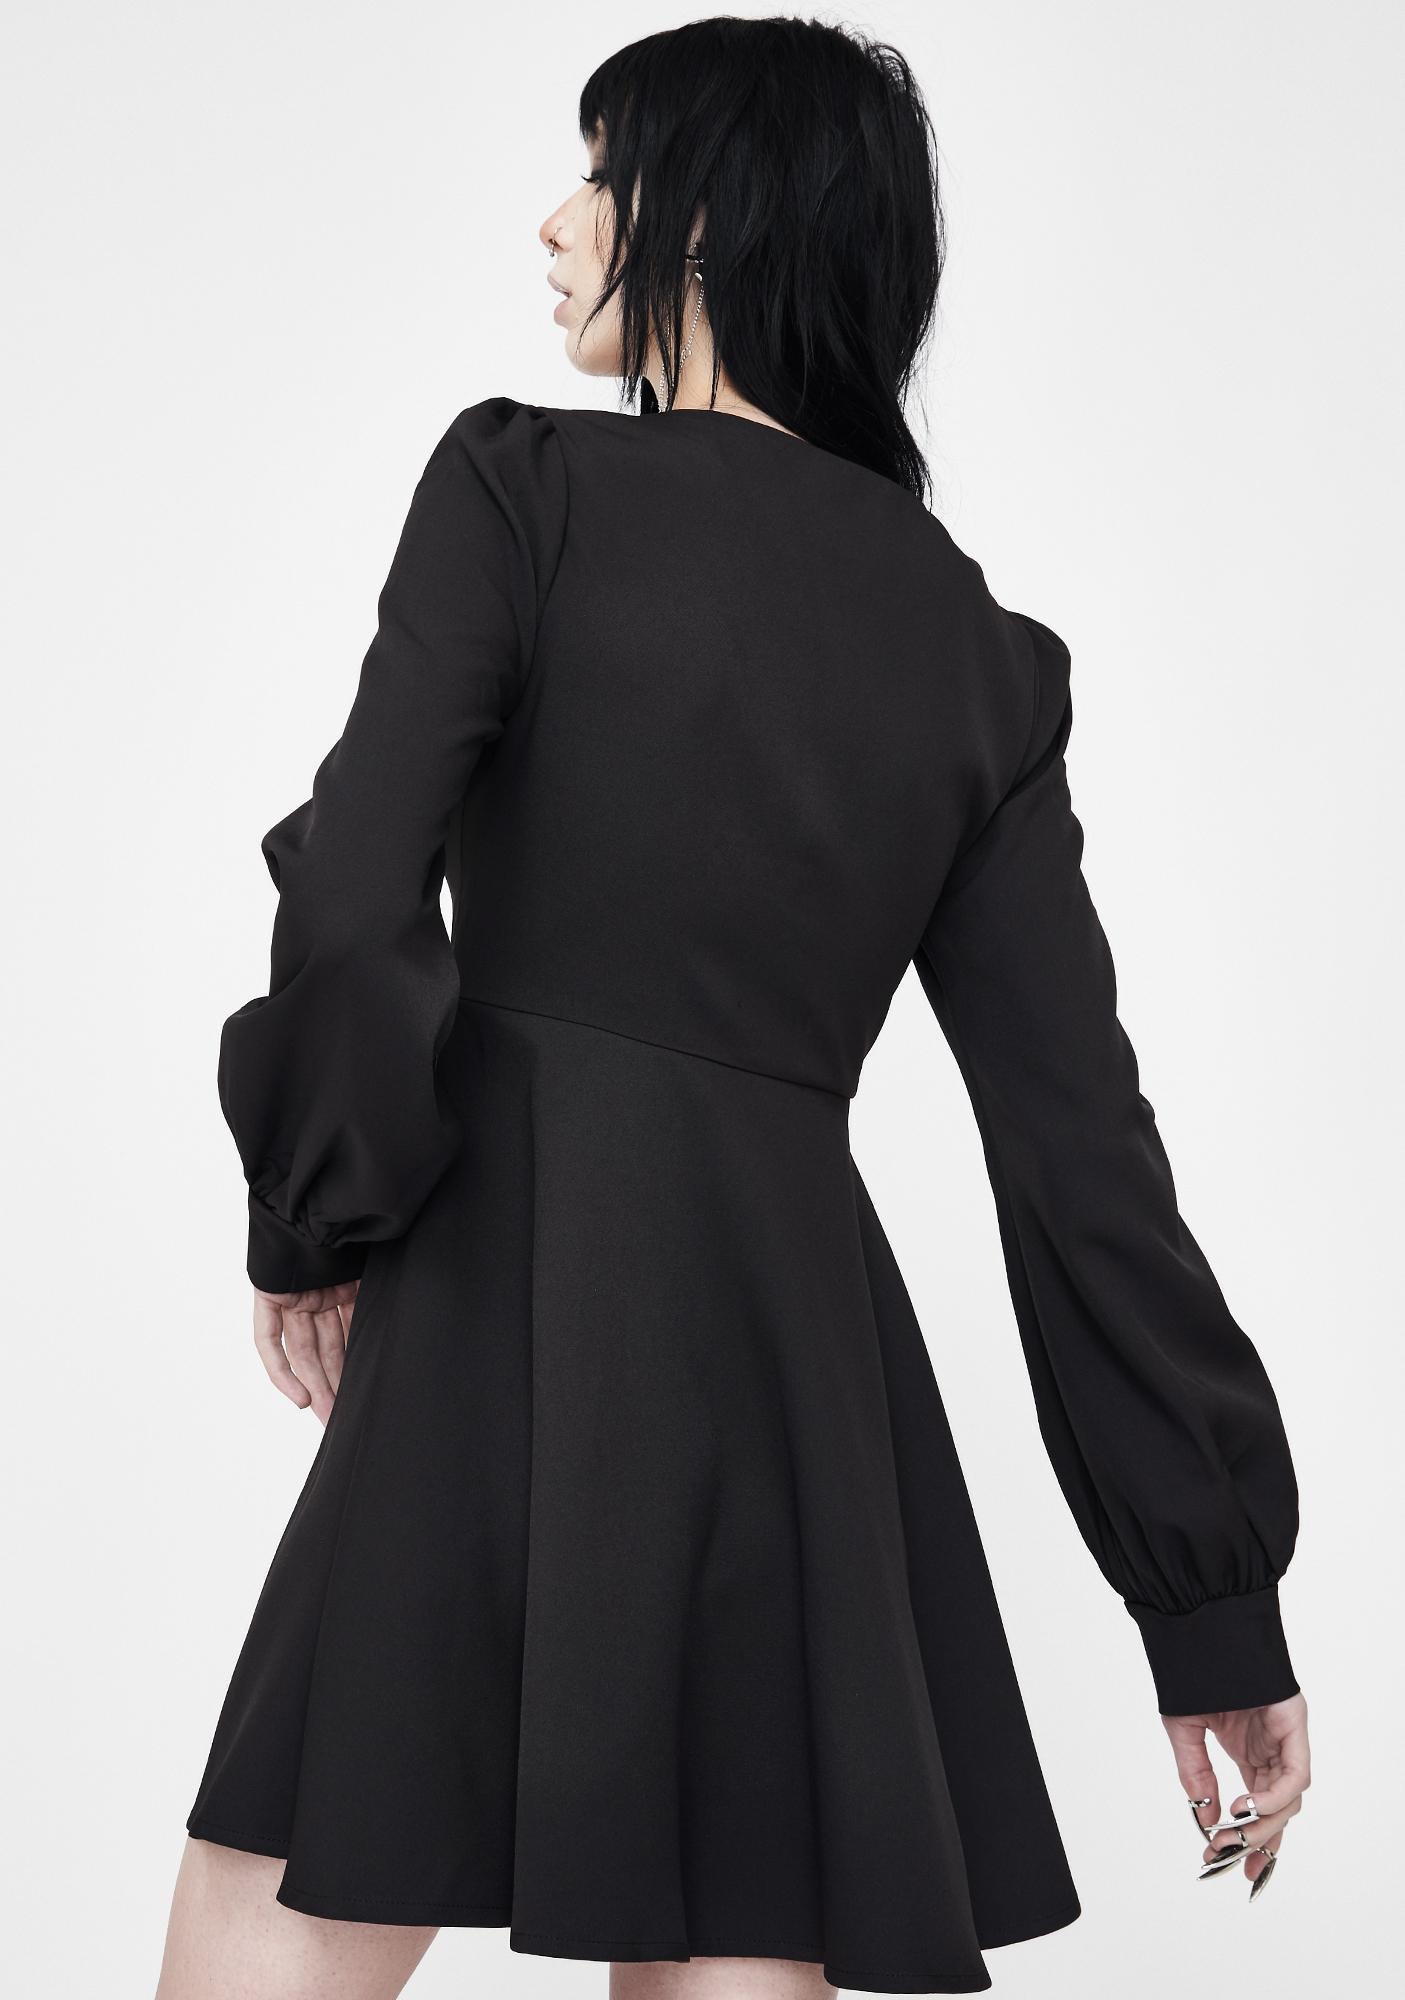 Punk Rave High Waist Lace Up Dress